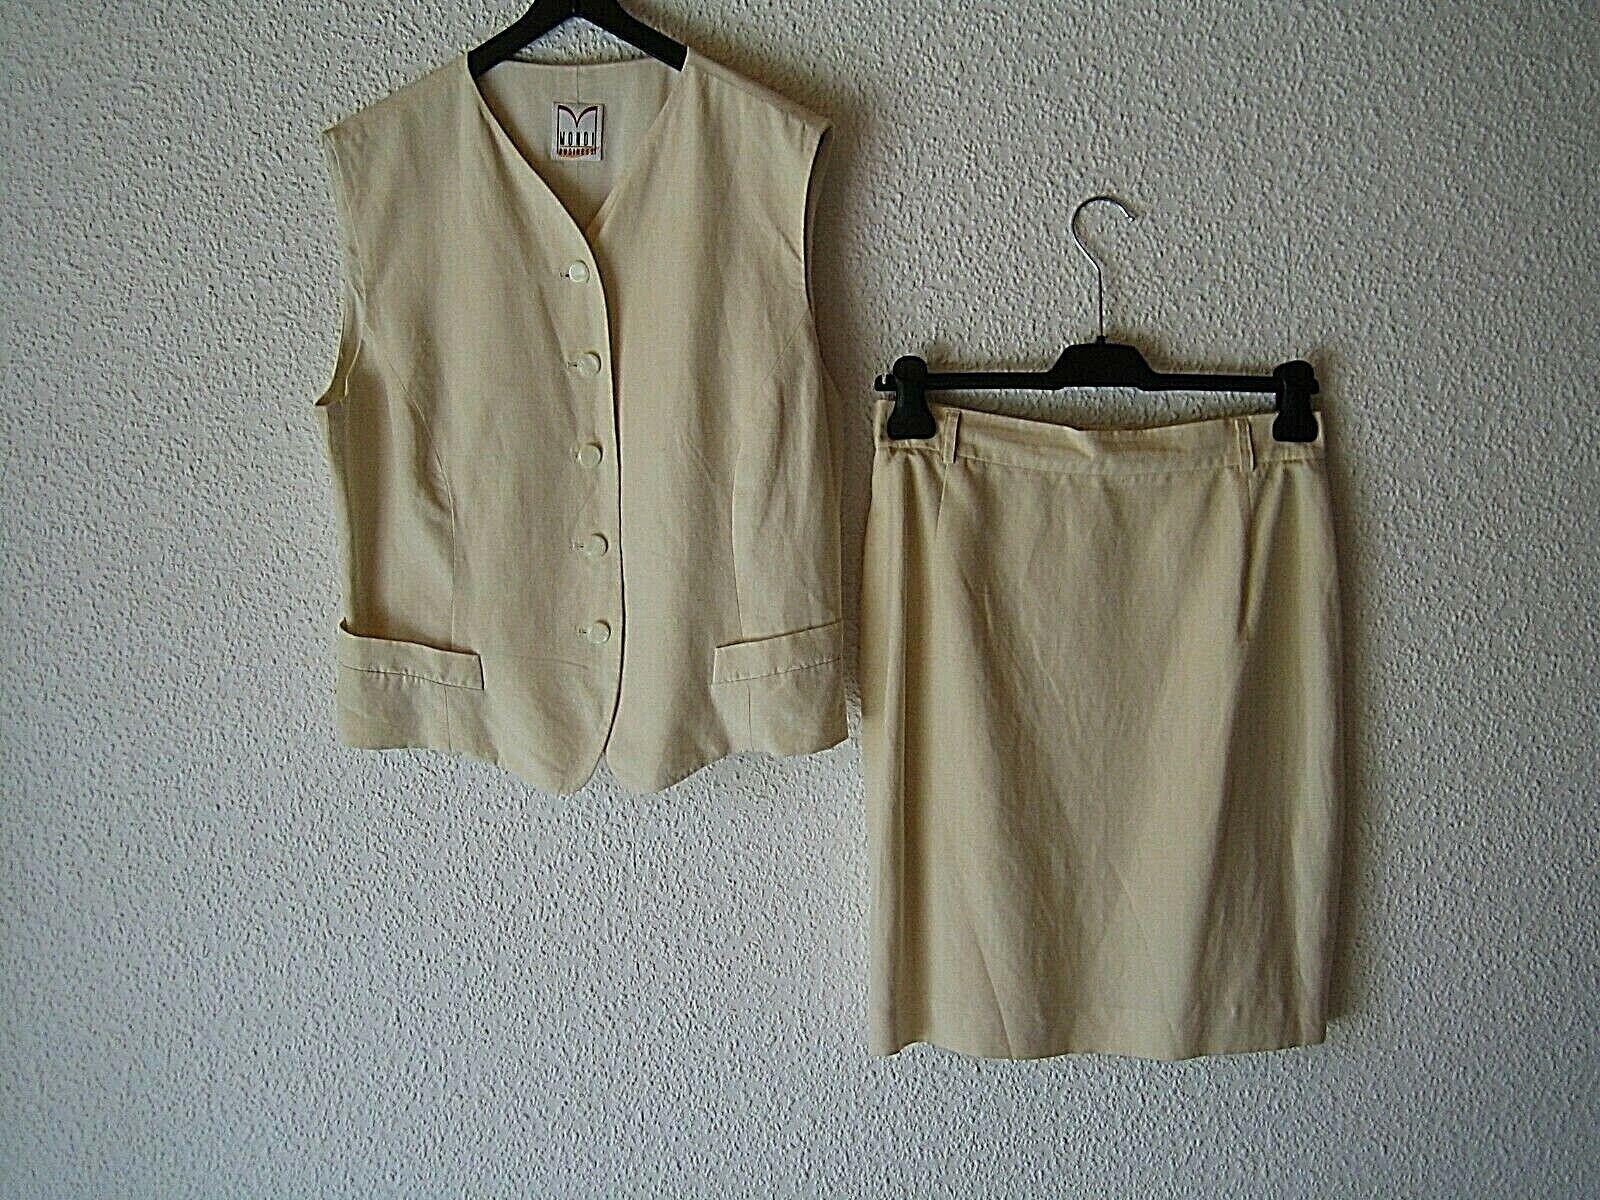 2 pieces: Mini-Skirt and Waistcoat BY 'MONDI Business